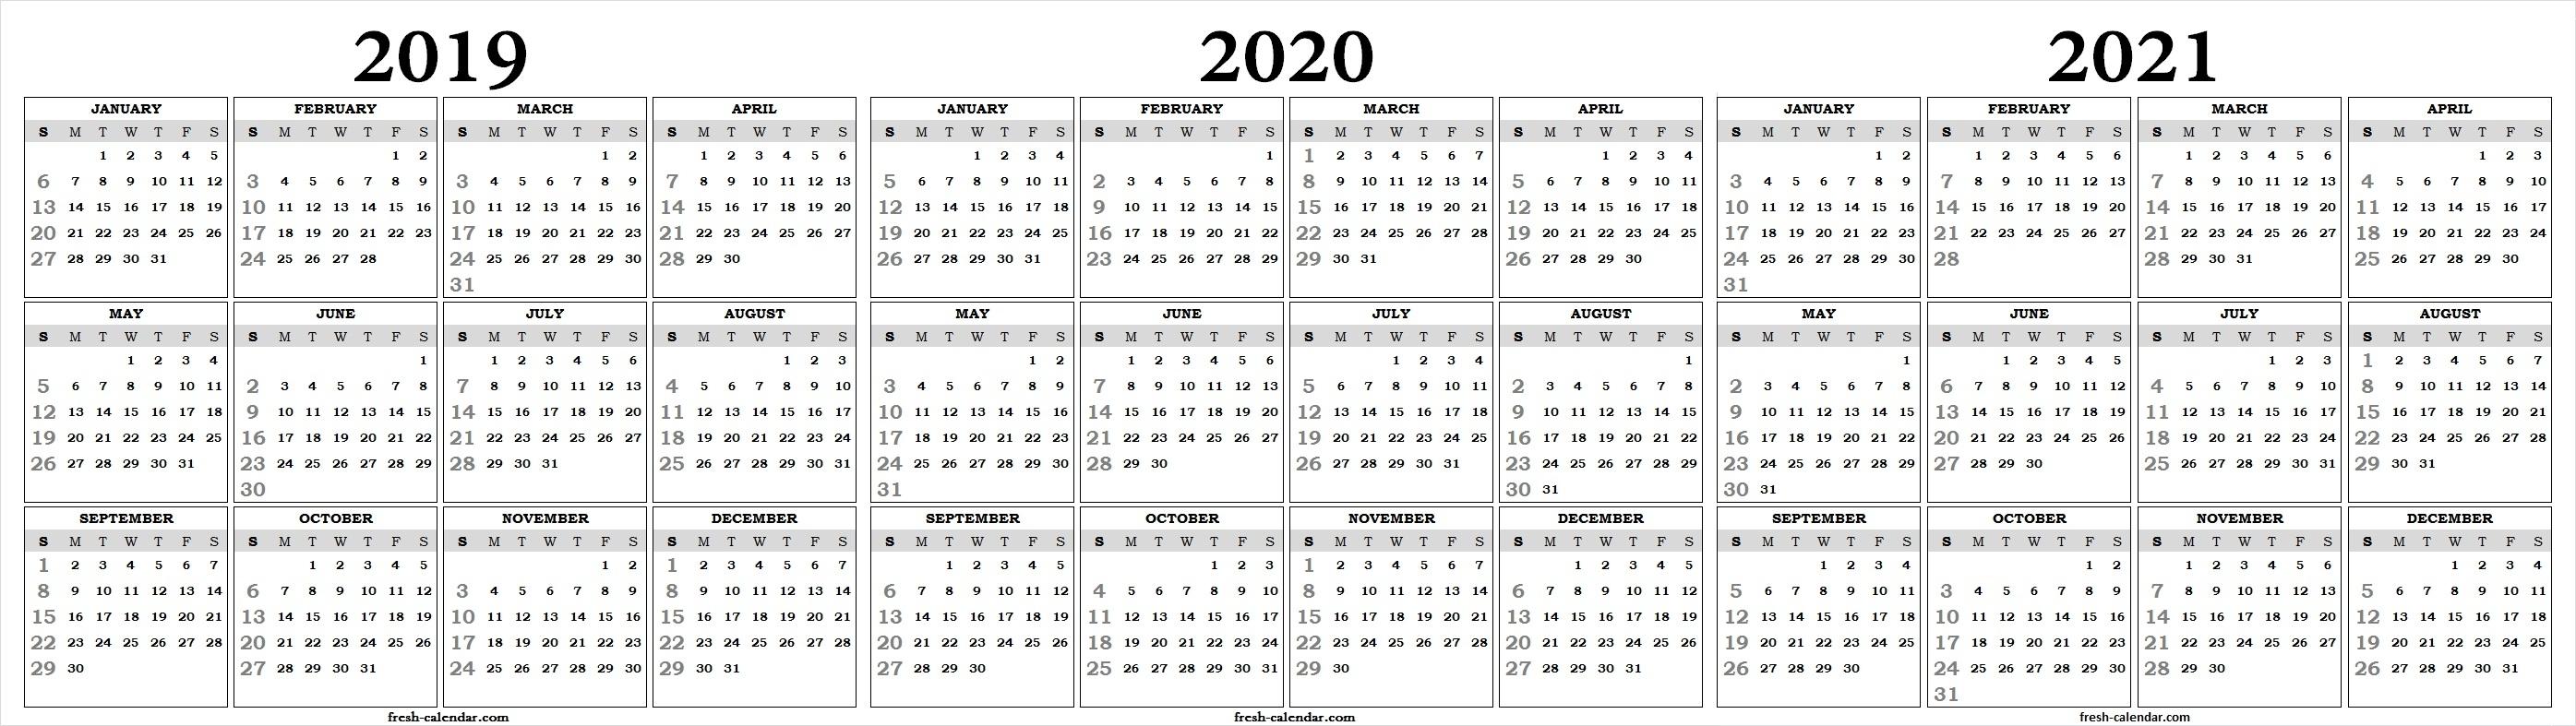 Three Yearly 2019 2020 2021 Calendar Printable Free | Blank Template for 3 Year Calendar 2019 2020 2021